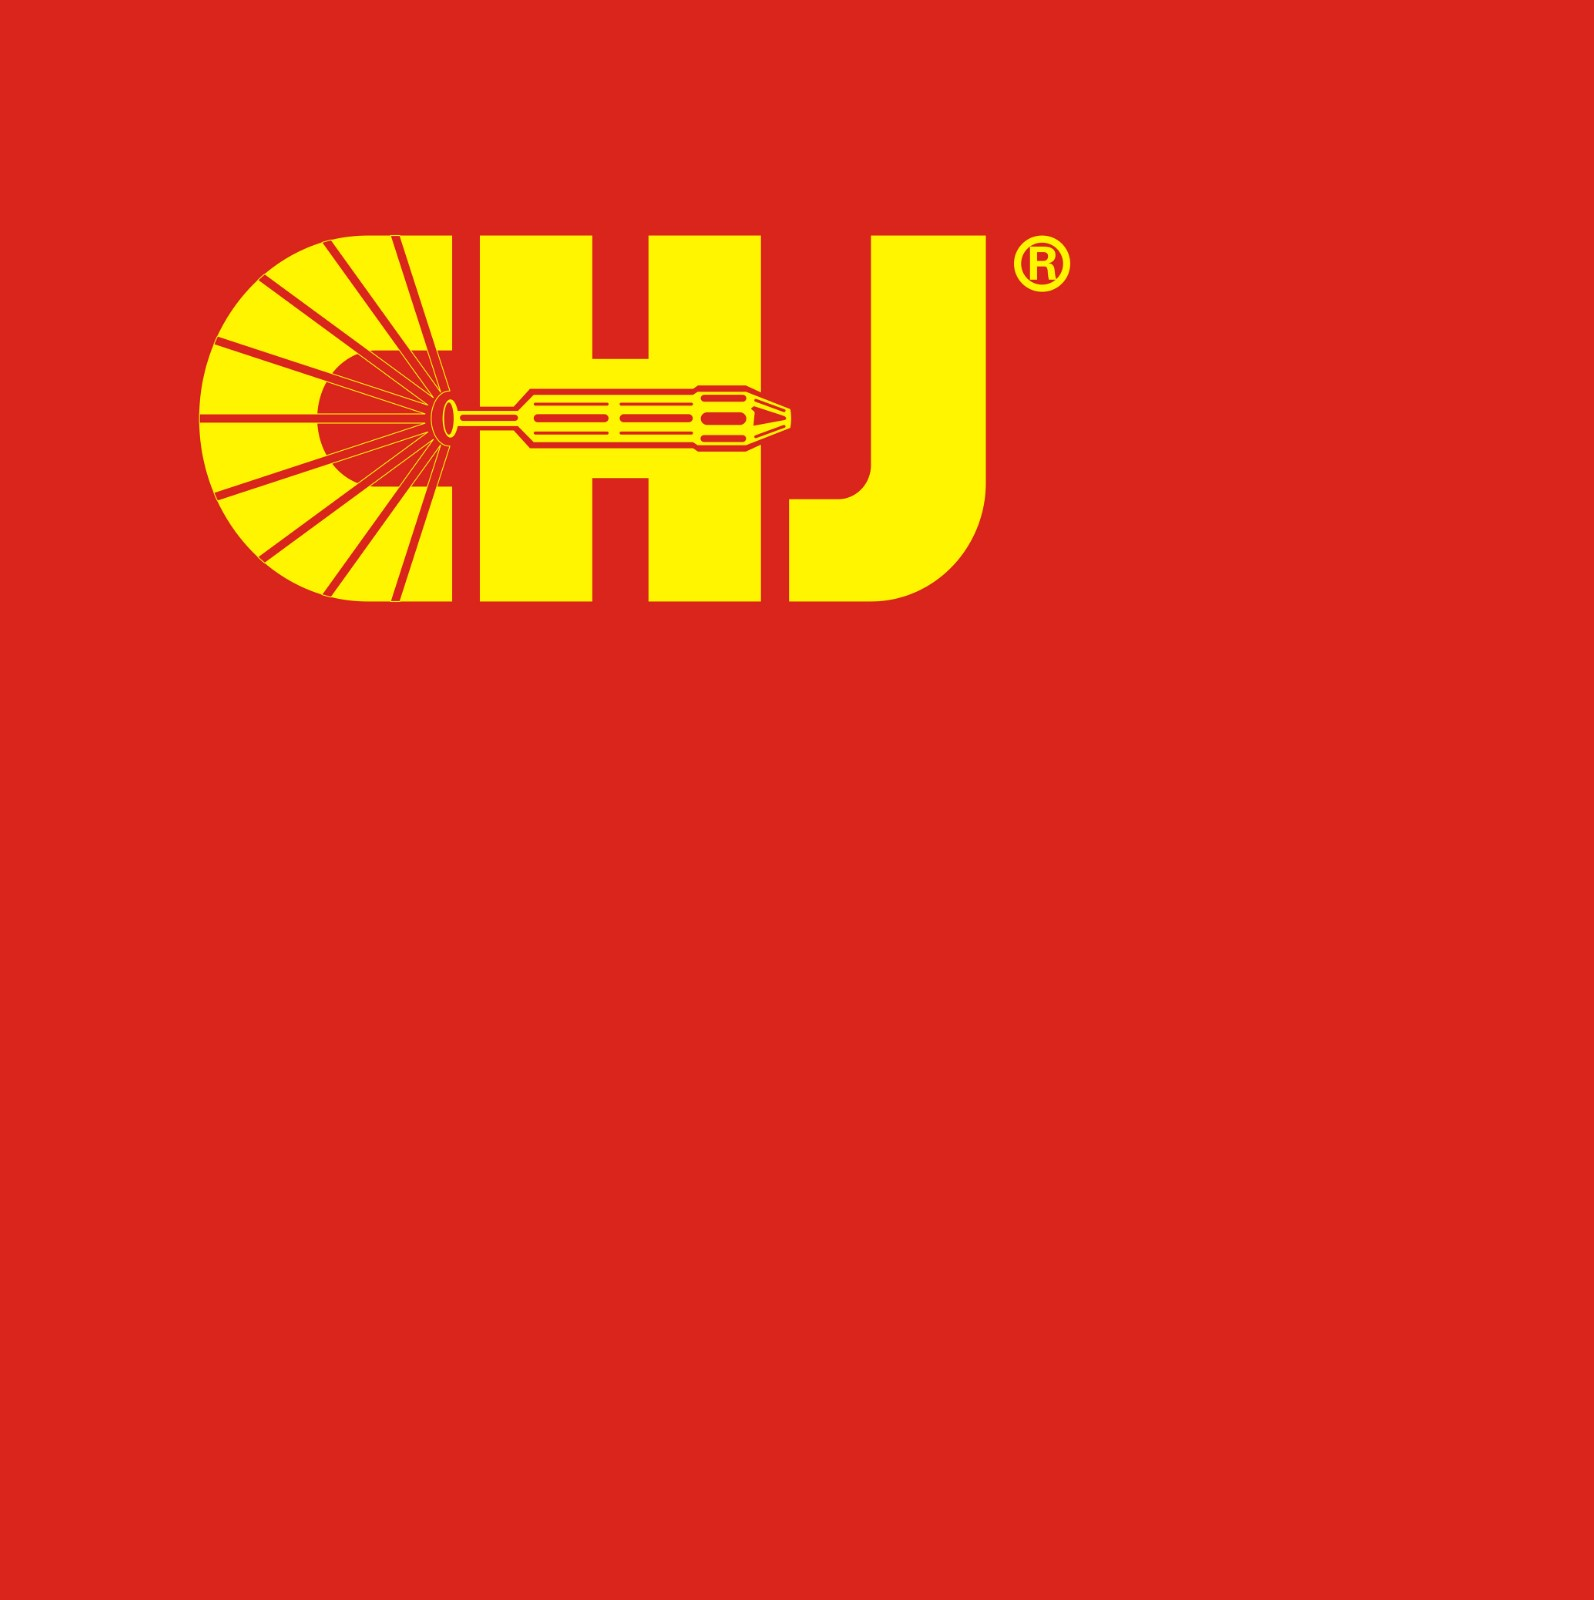 Chinahanji power Co.,Ltd